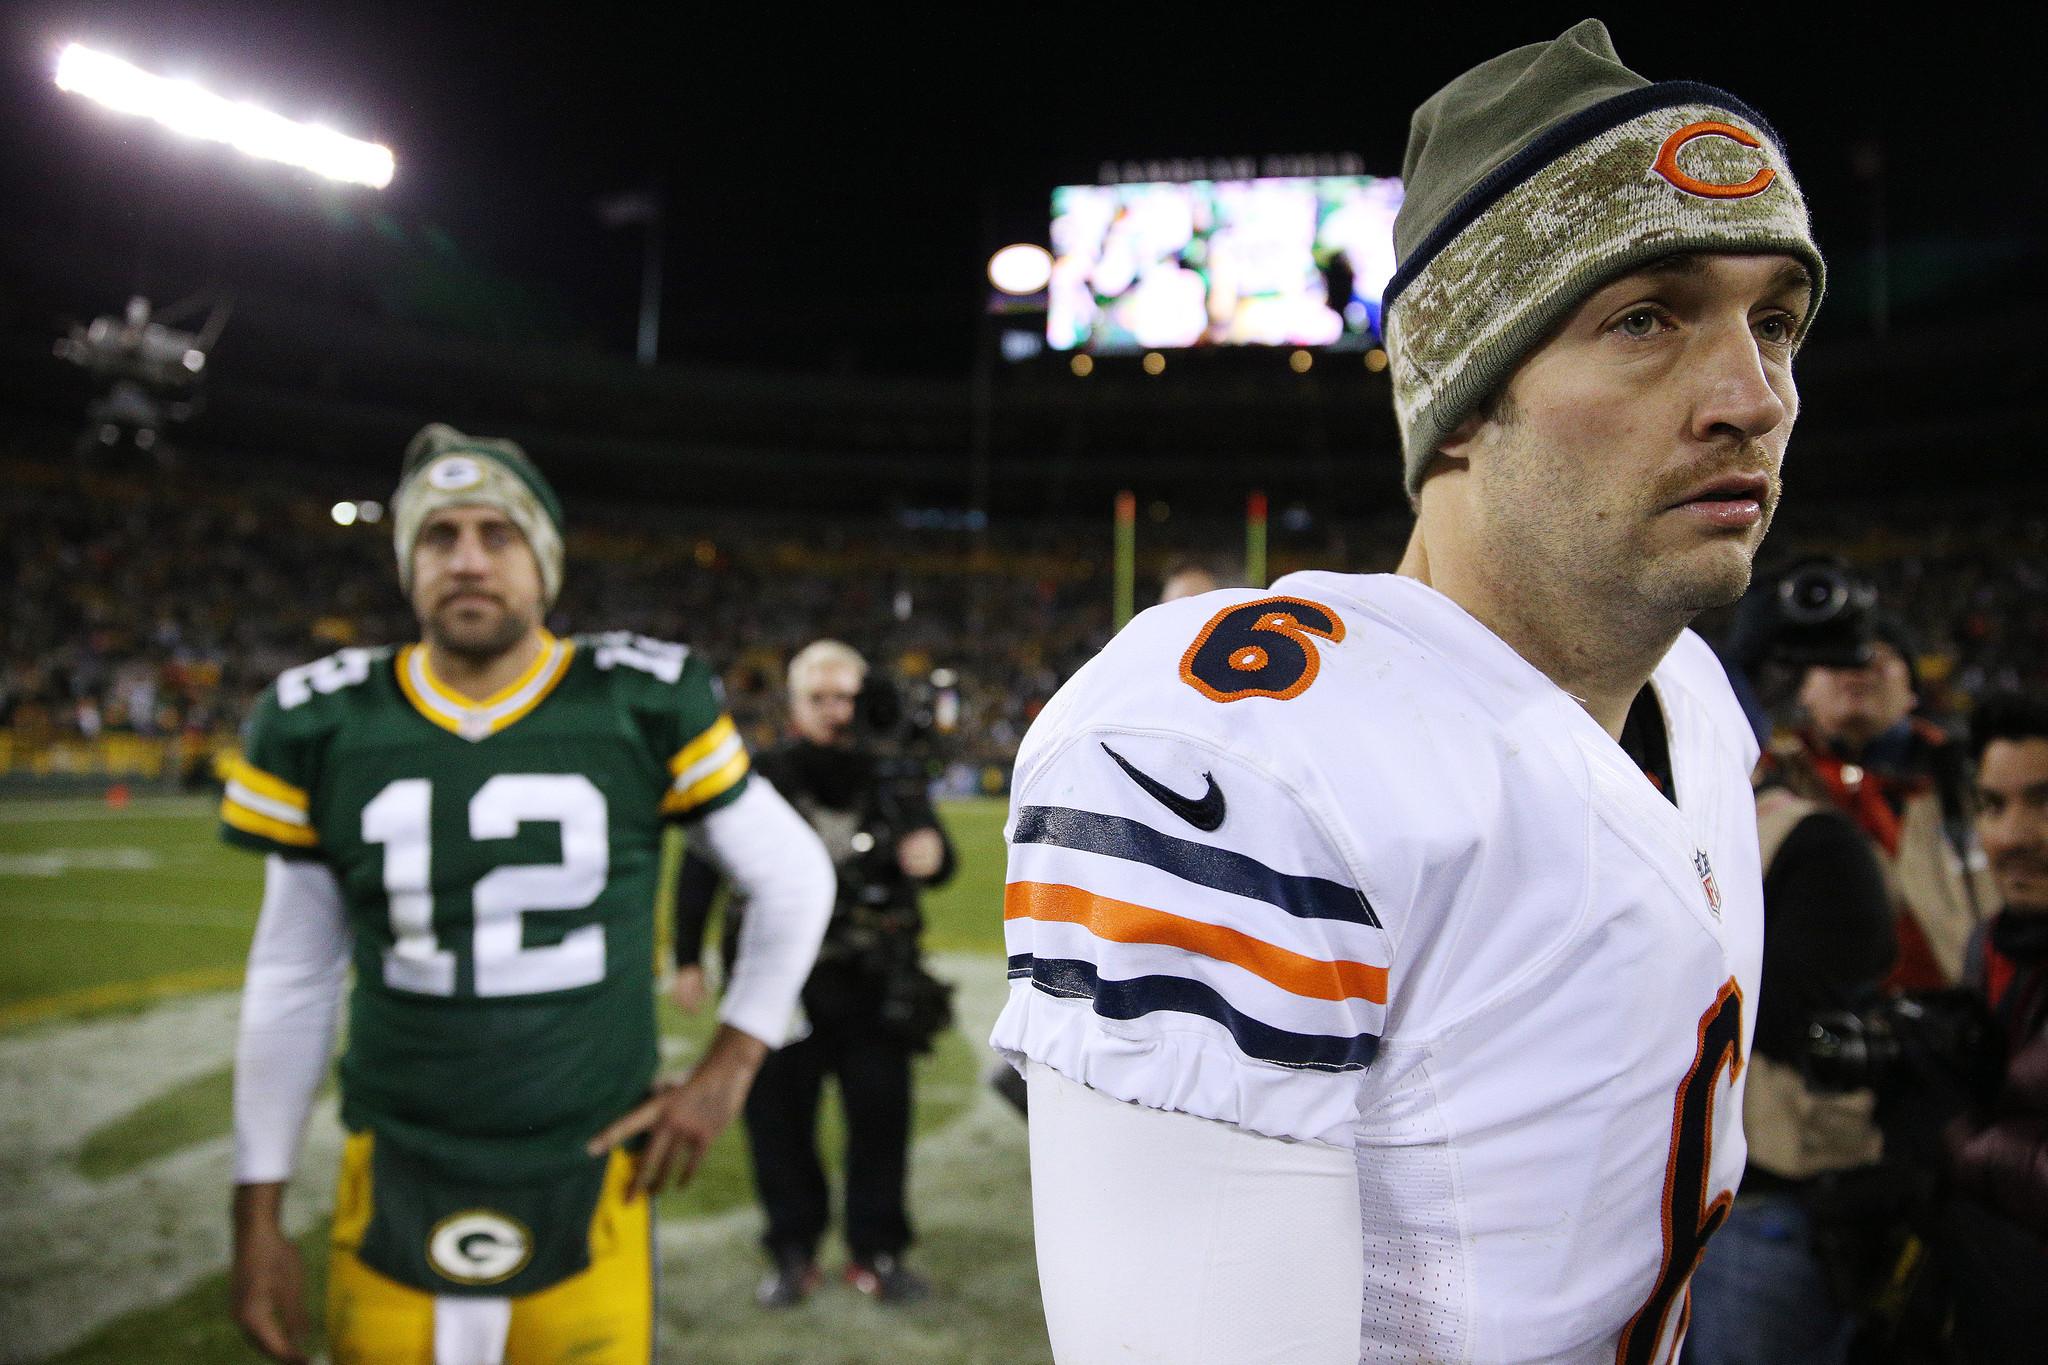 Fox's No. 1 broadcast team to call Bears-Packers season opener